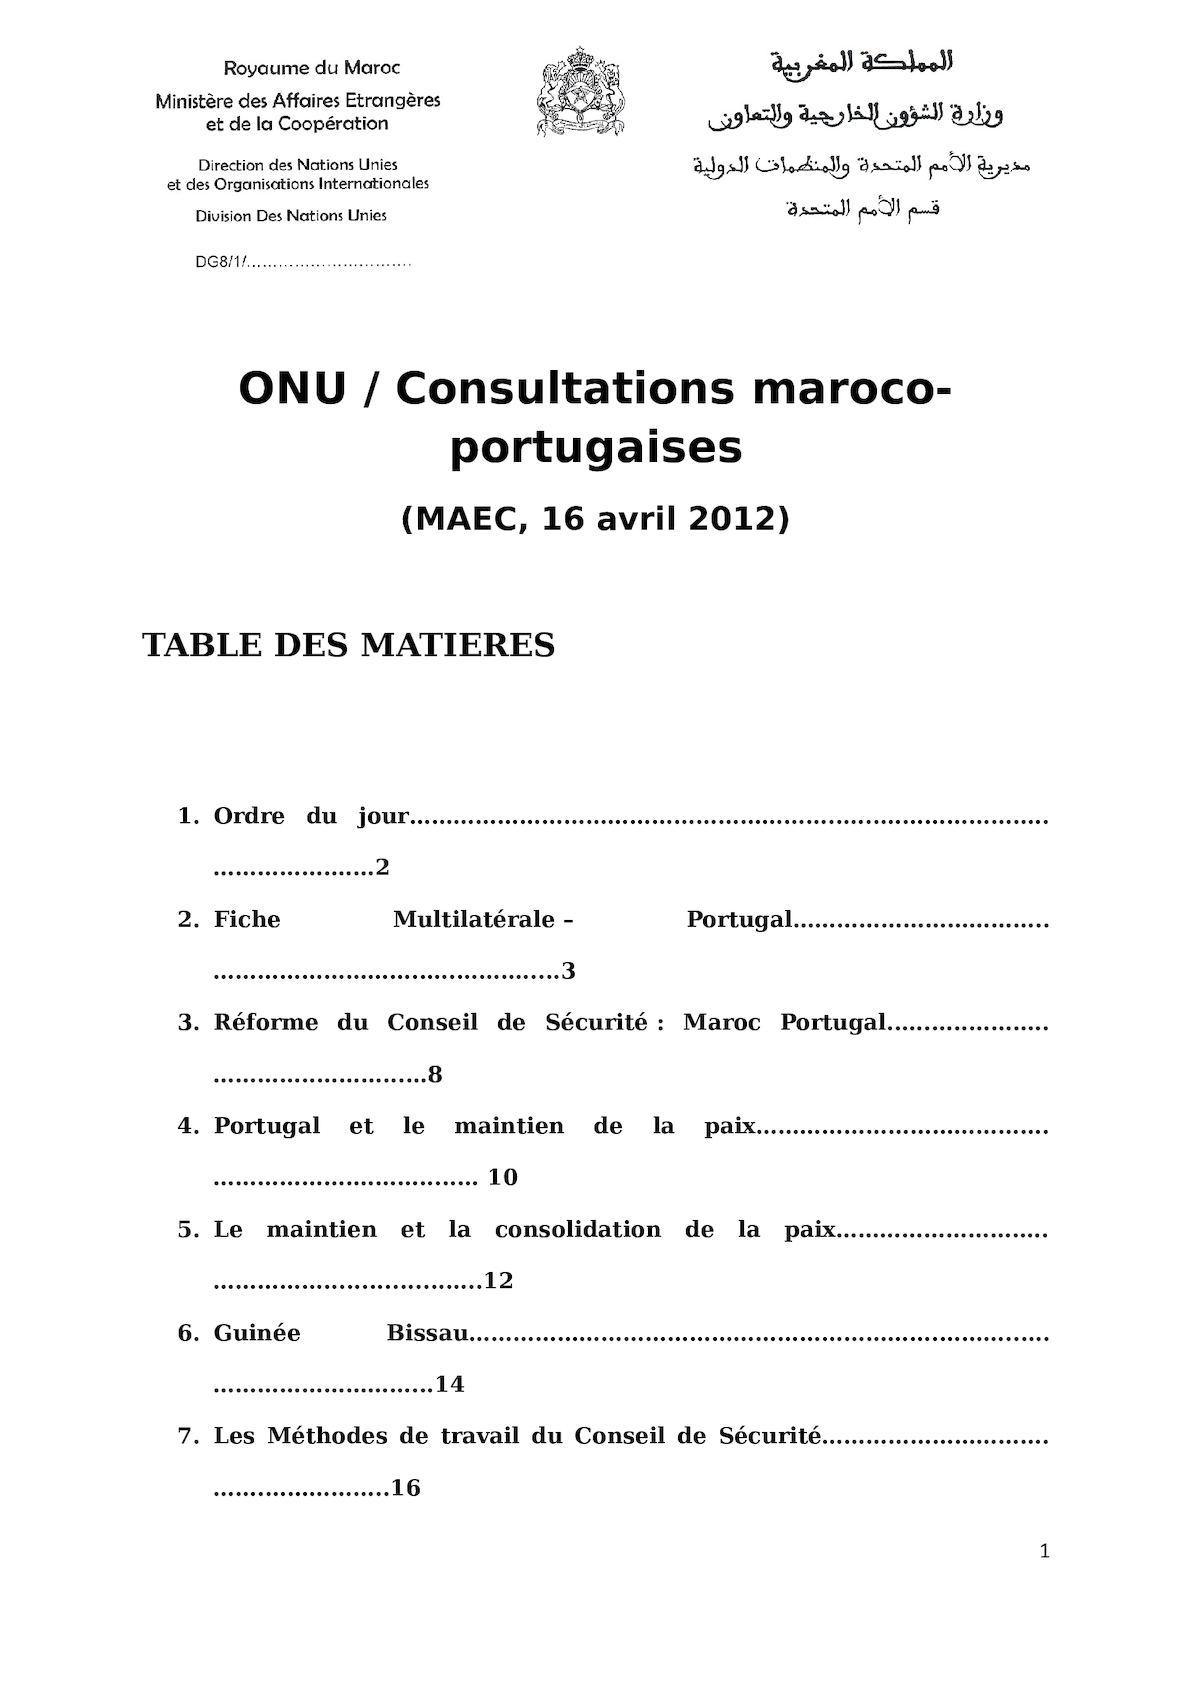 CS Consultations Multilatérales 16 Avril 2012 - Document Final Version 2